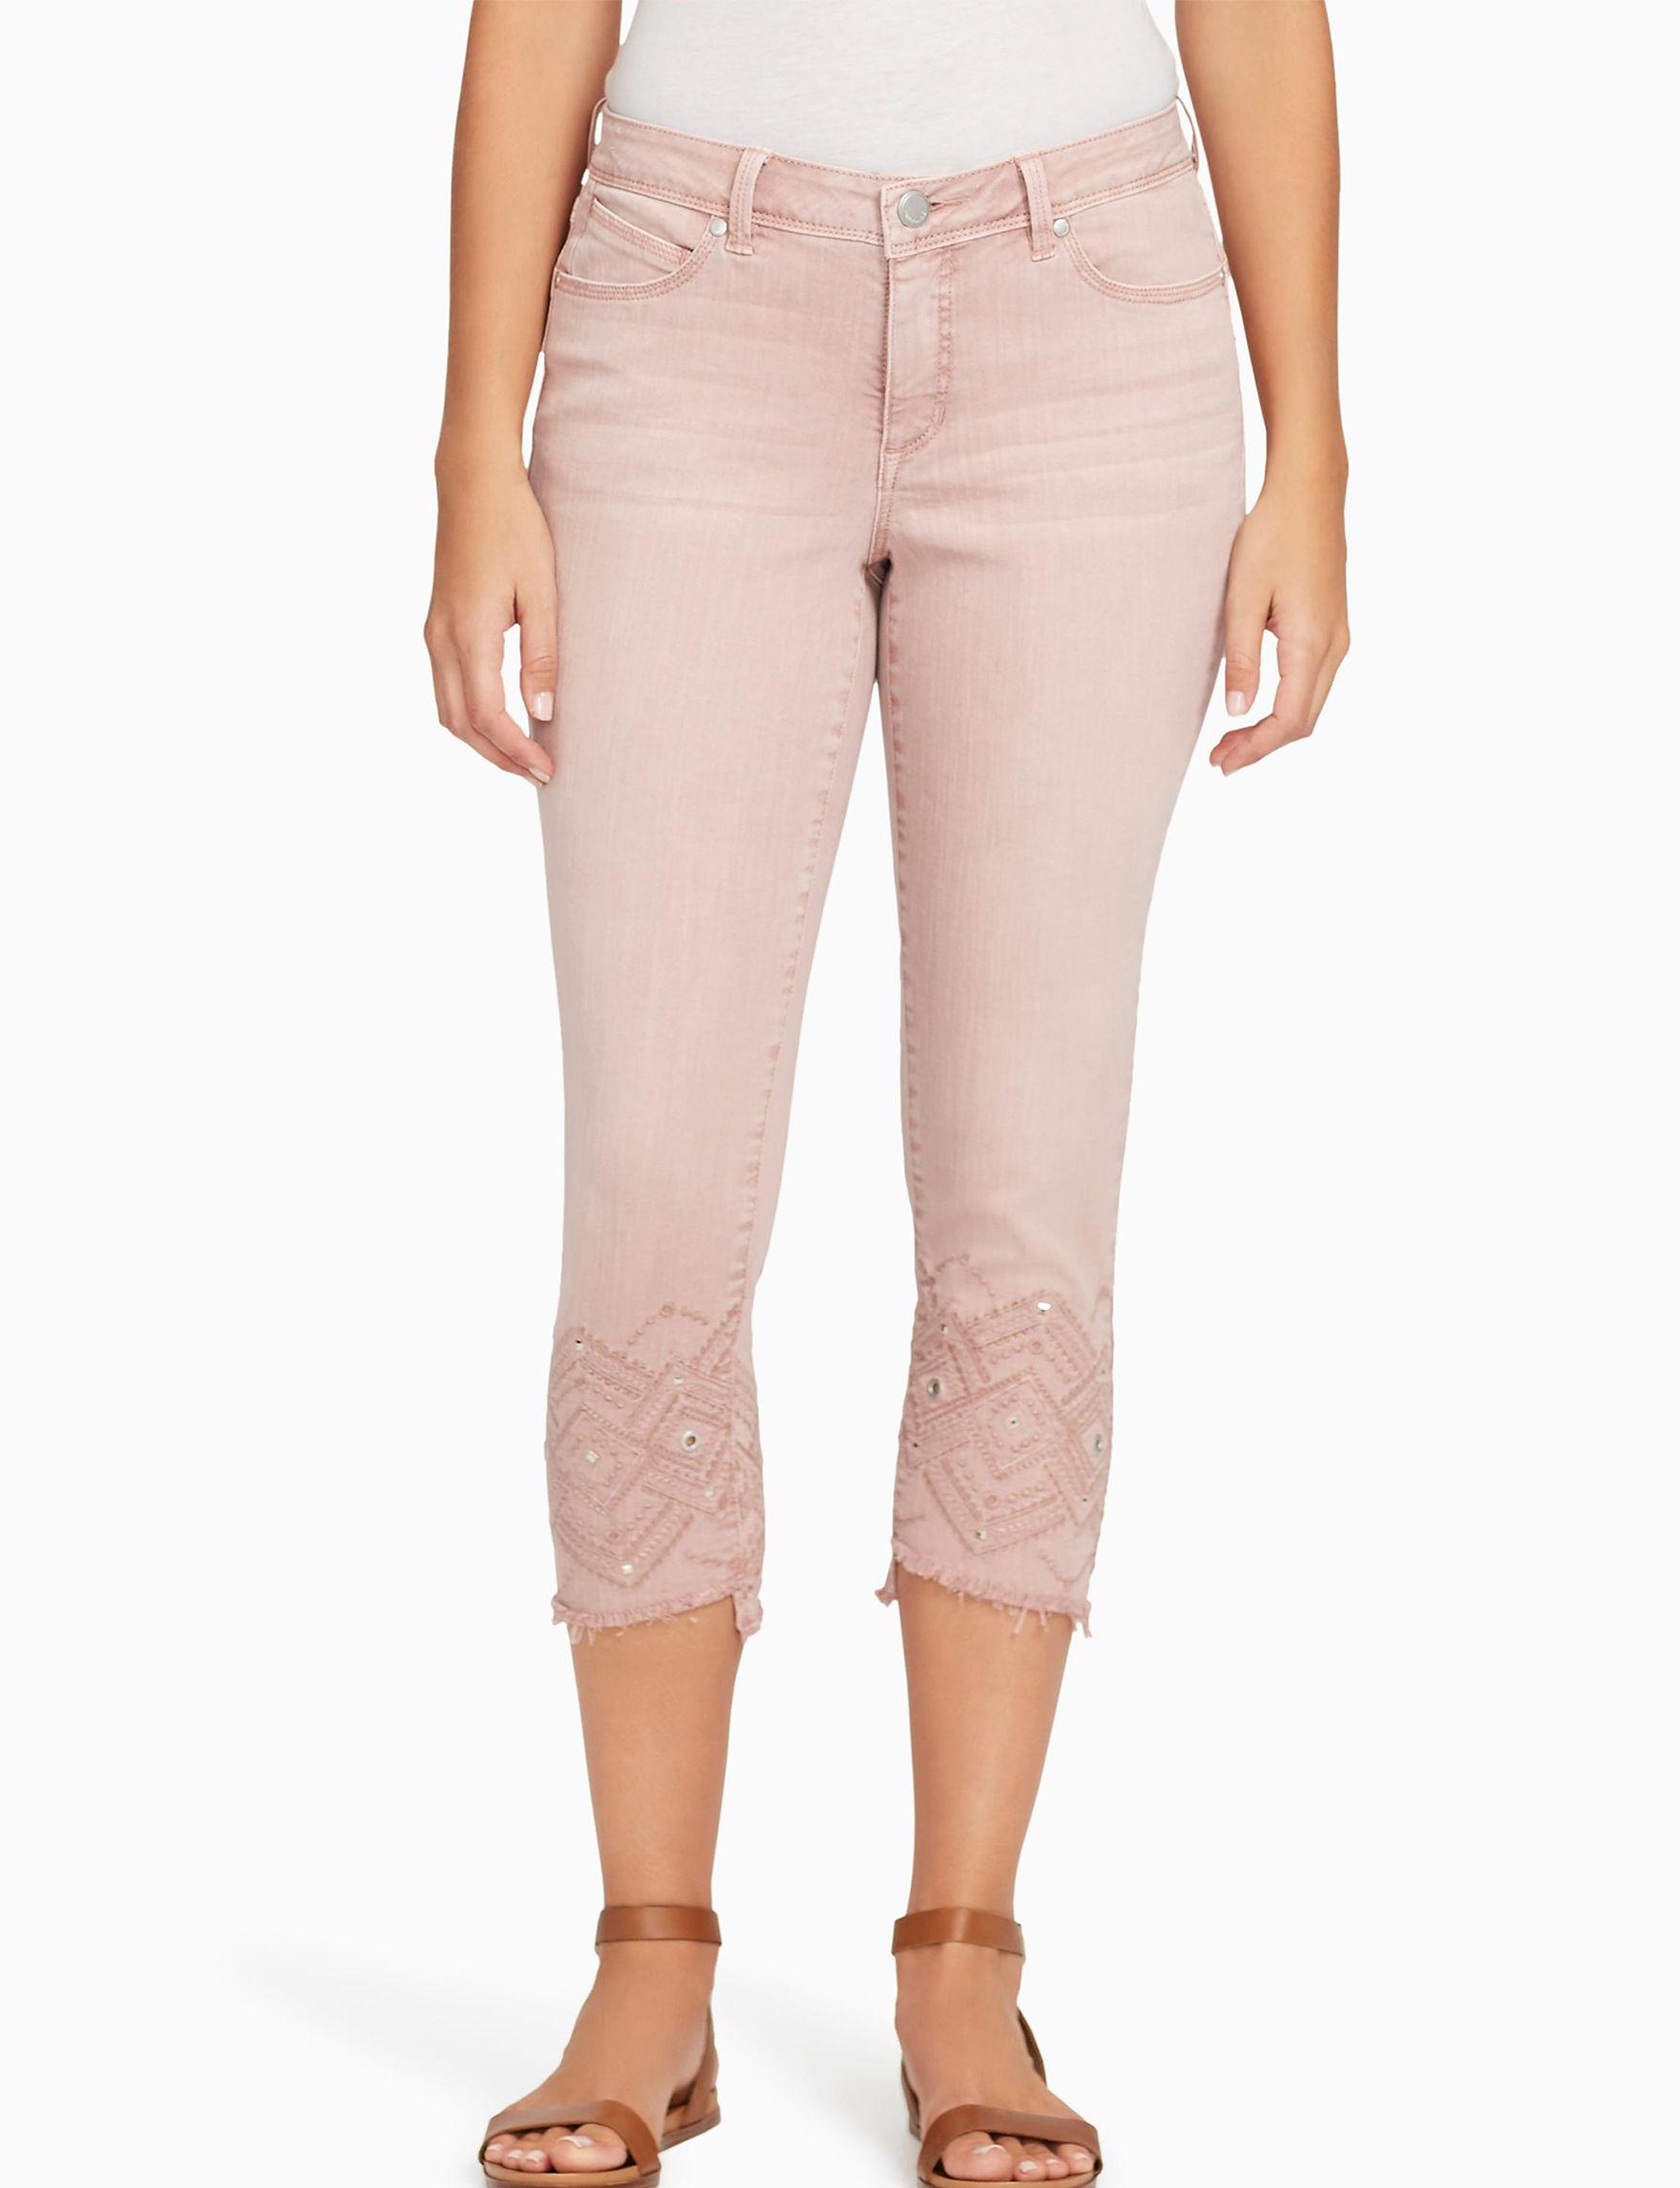 Bandolino Pink Capris & Crops